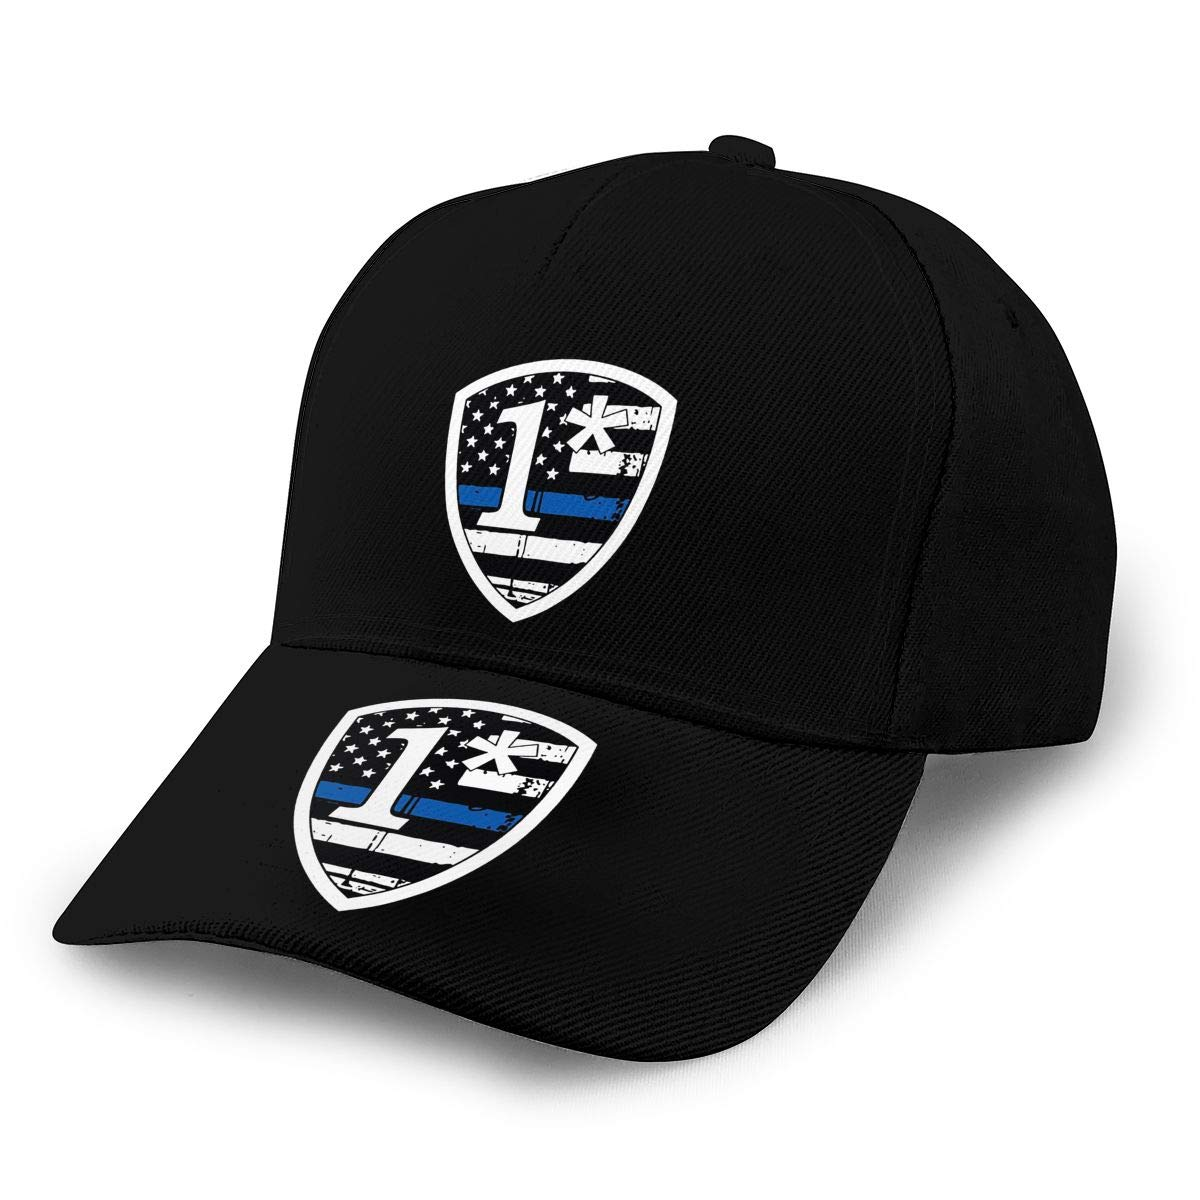 Thin Blue Line Tattered Flag 1 Asterisk Unisex Adult Hats Classic Baseball Caps Peaked Cap